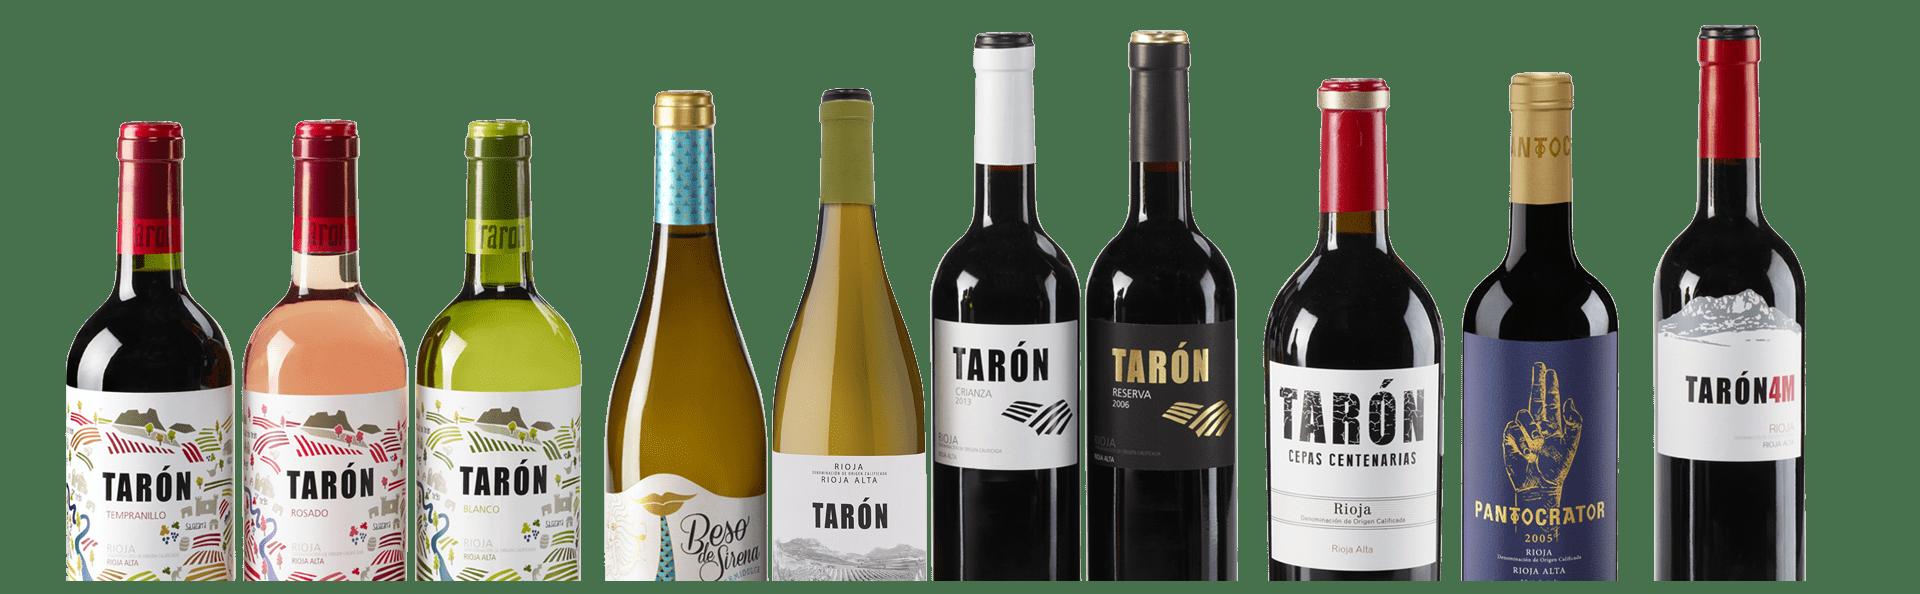 bodegas-taron-vinos-bodegon-completo-02 – 3